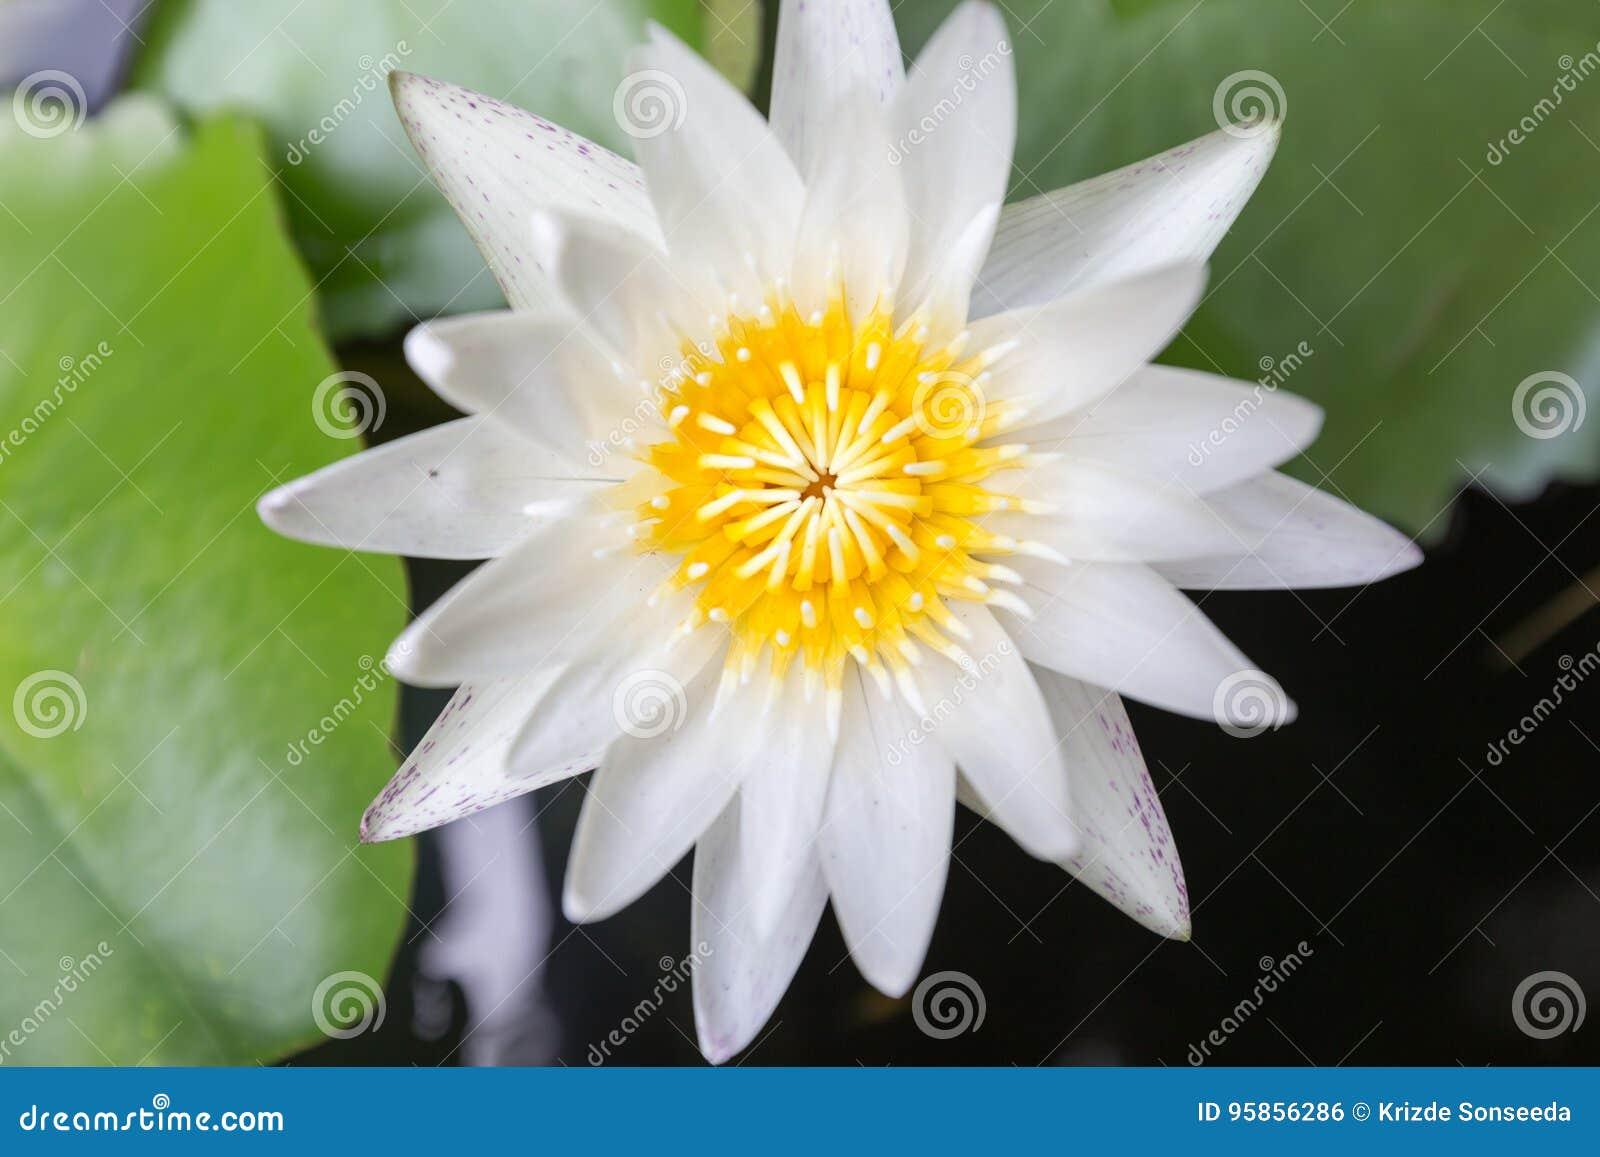 Close up beautiful lotus flower white lotus flower select focus download close up beautiful lotus flower white lotus flower select focus blur or blurred izmirmasajfo